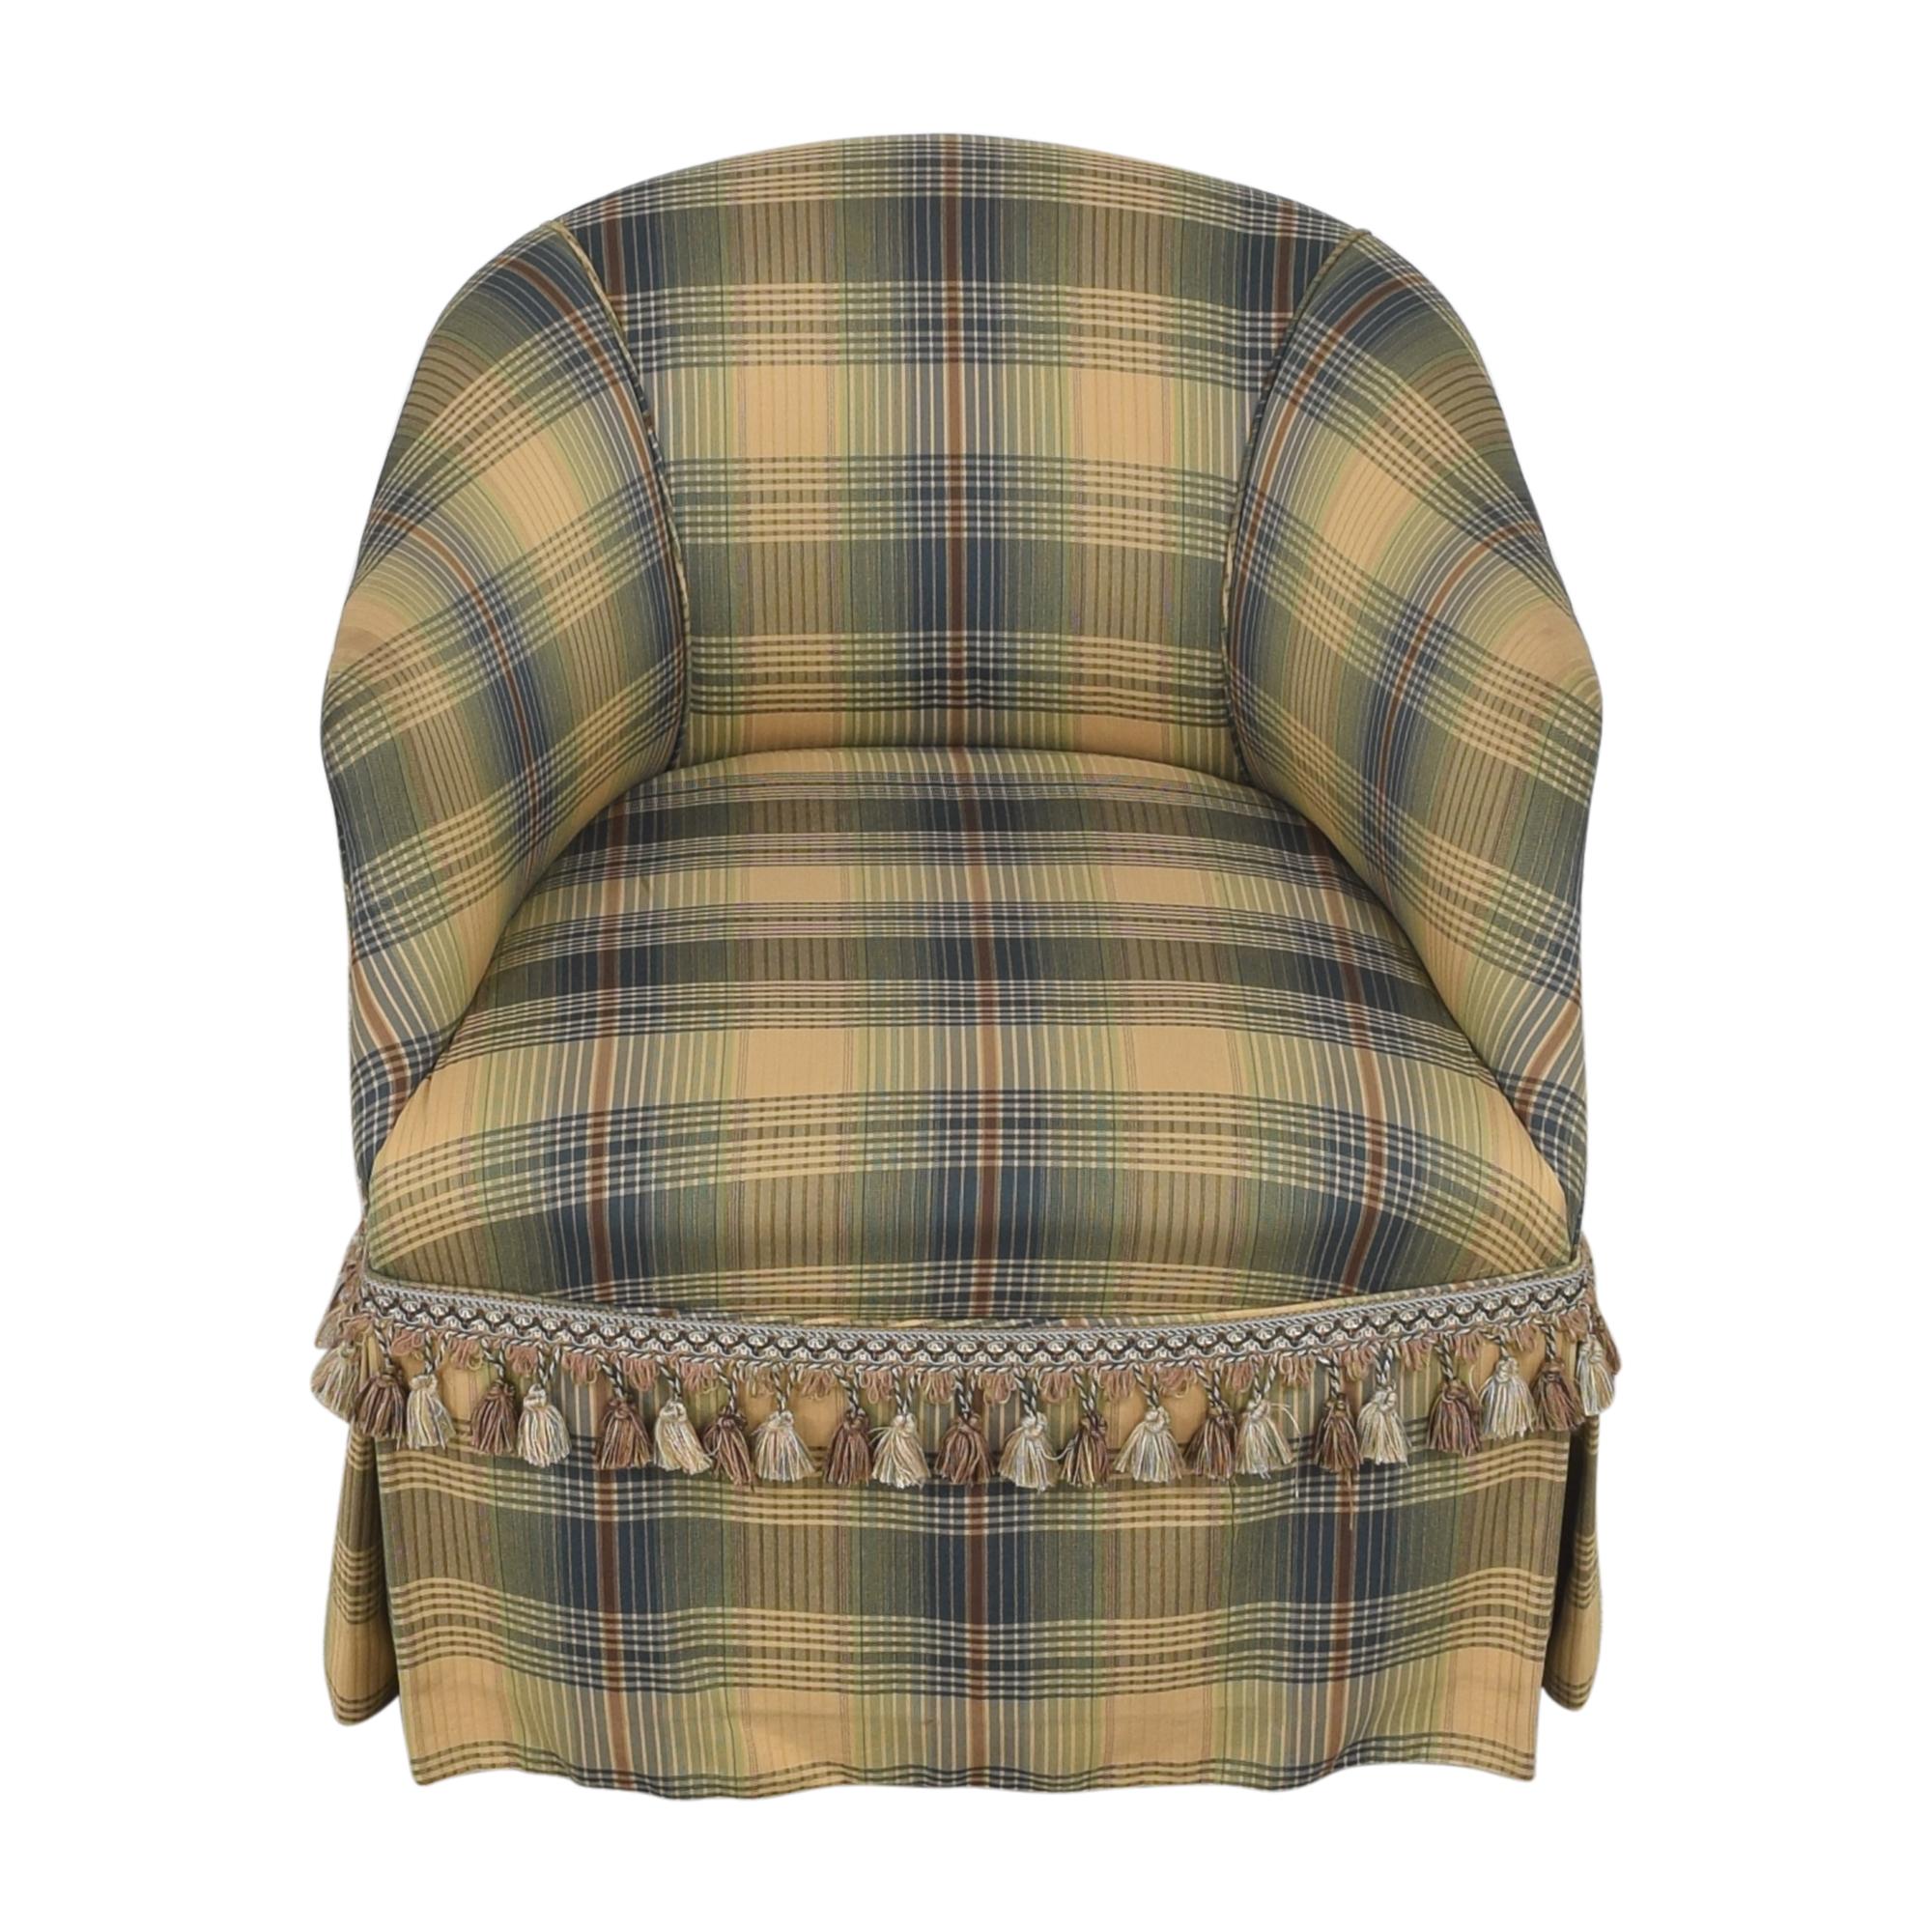 Custom Swivel Chair with Fringe nj